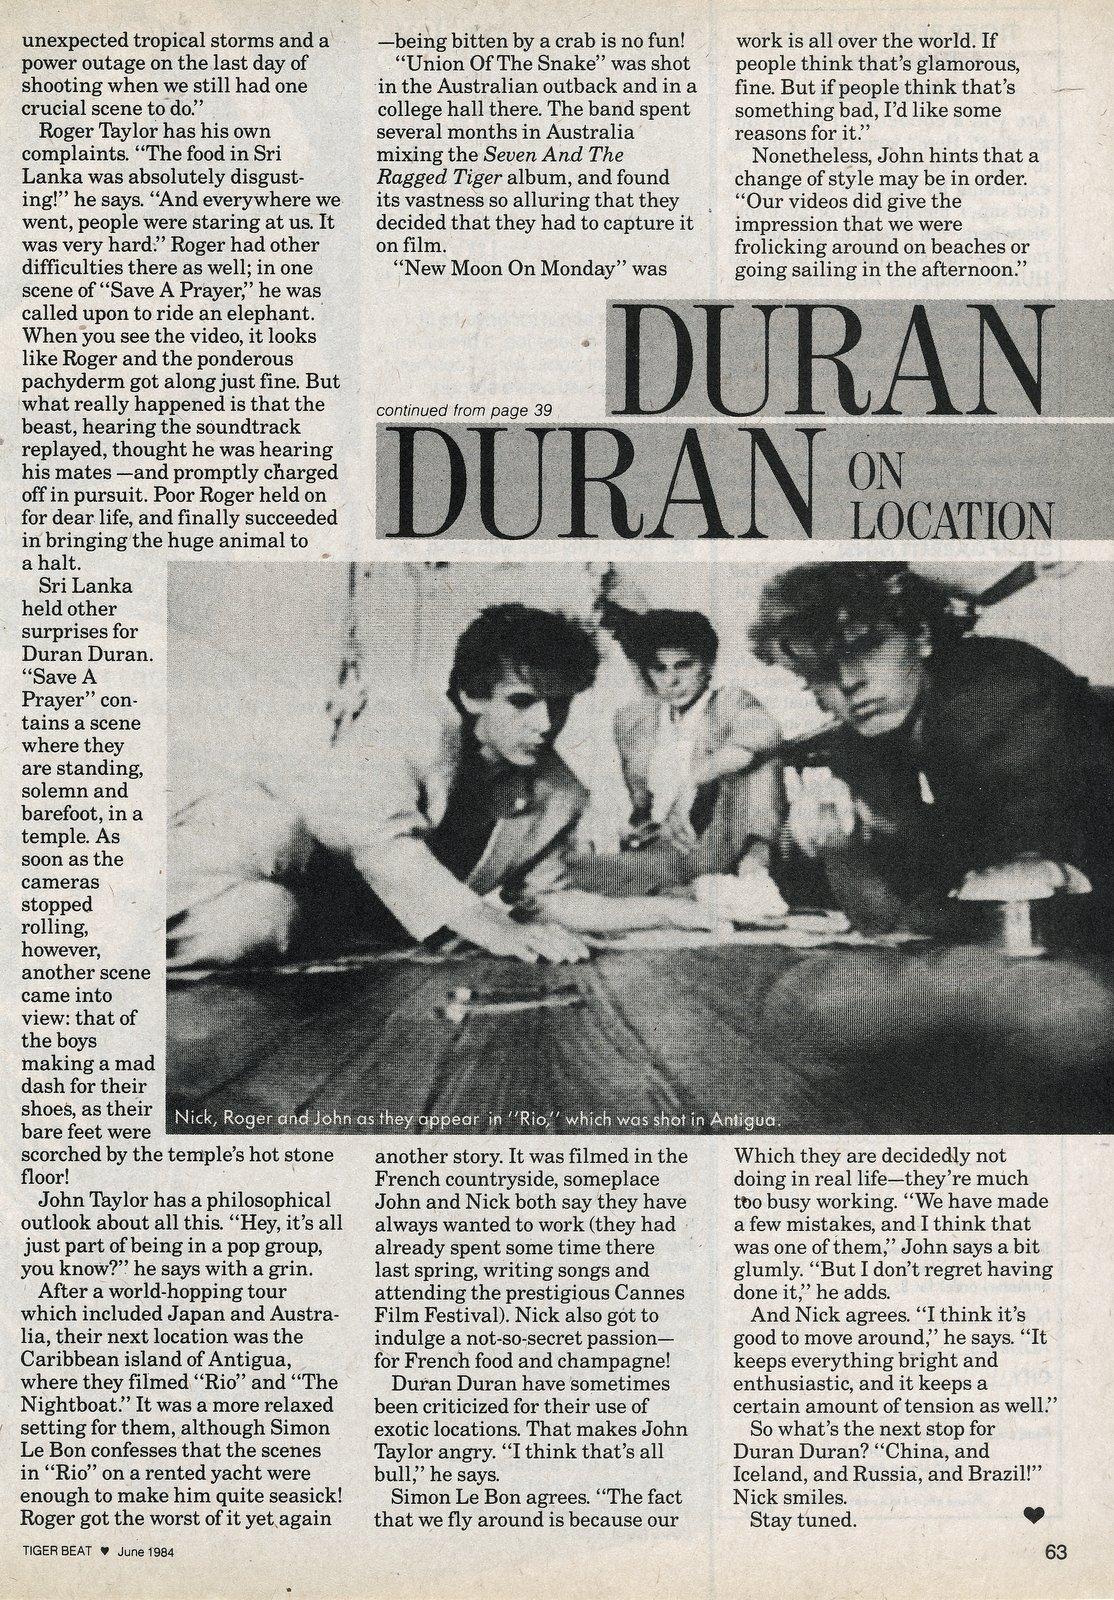 Duran Duran in Sri Lanka to film the Save A Prayer video 1980s (1)